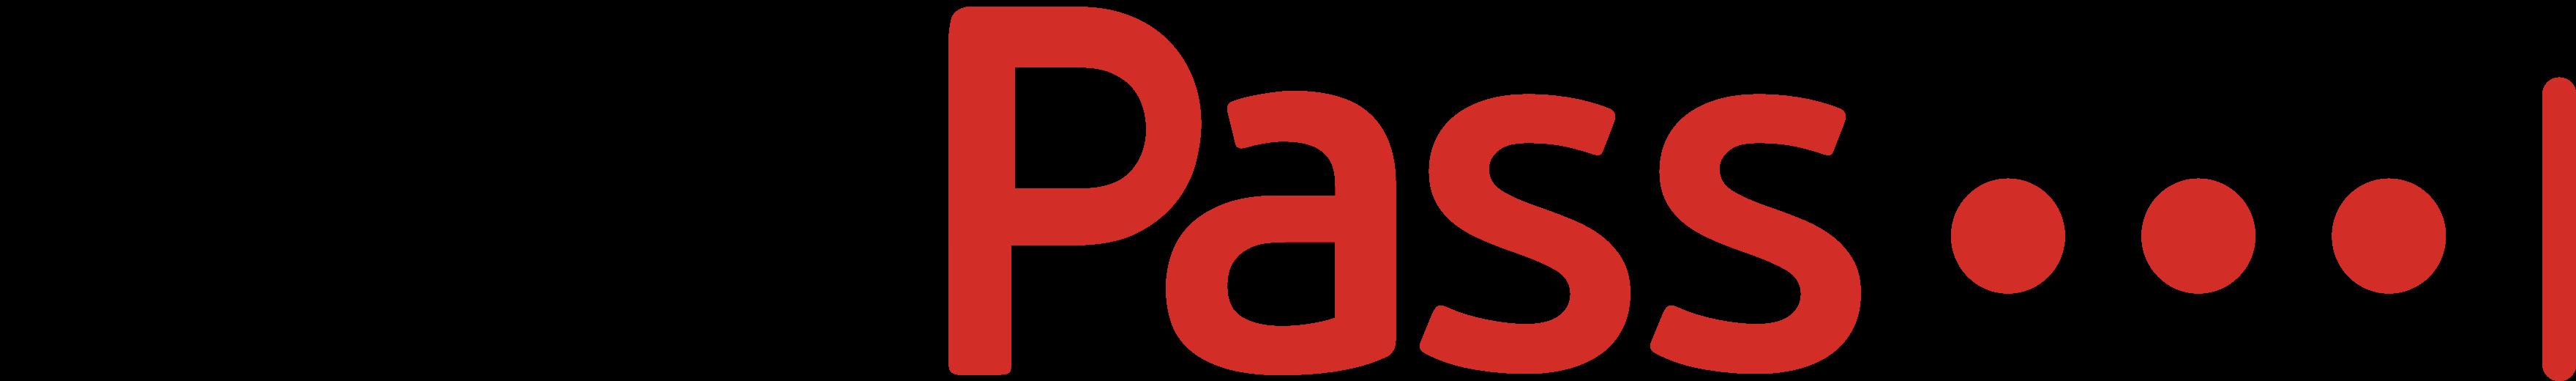 LastPass Logo